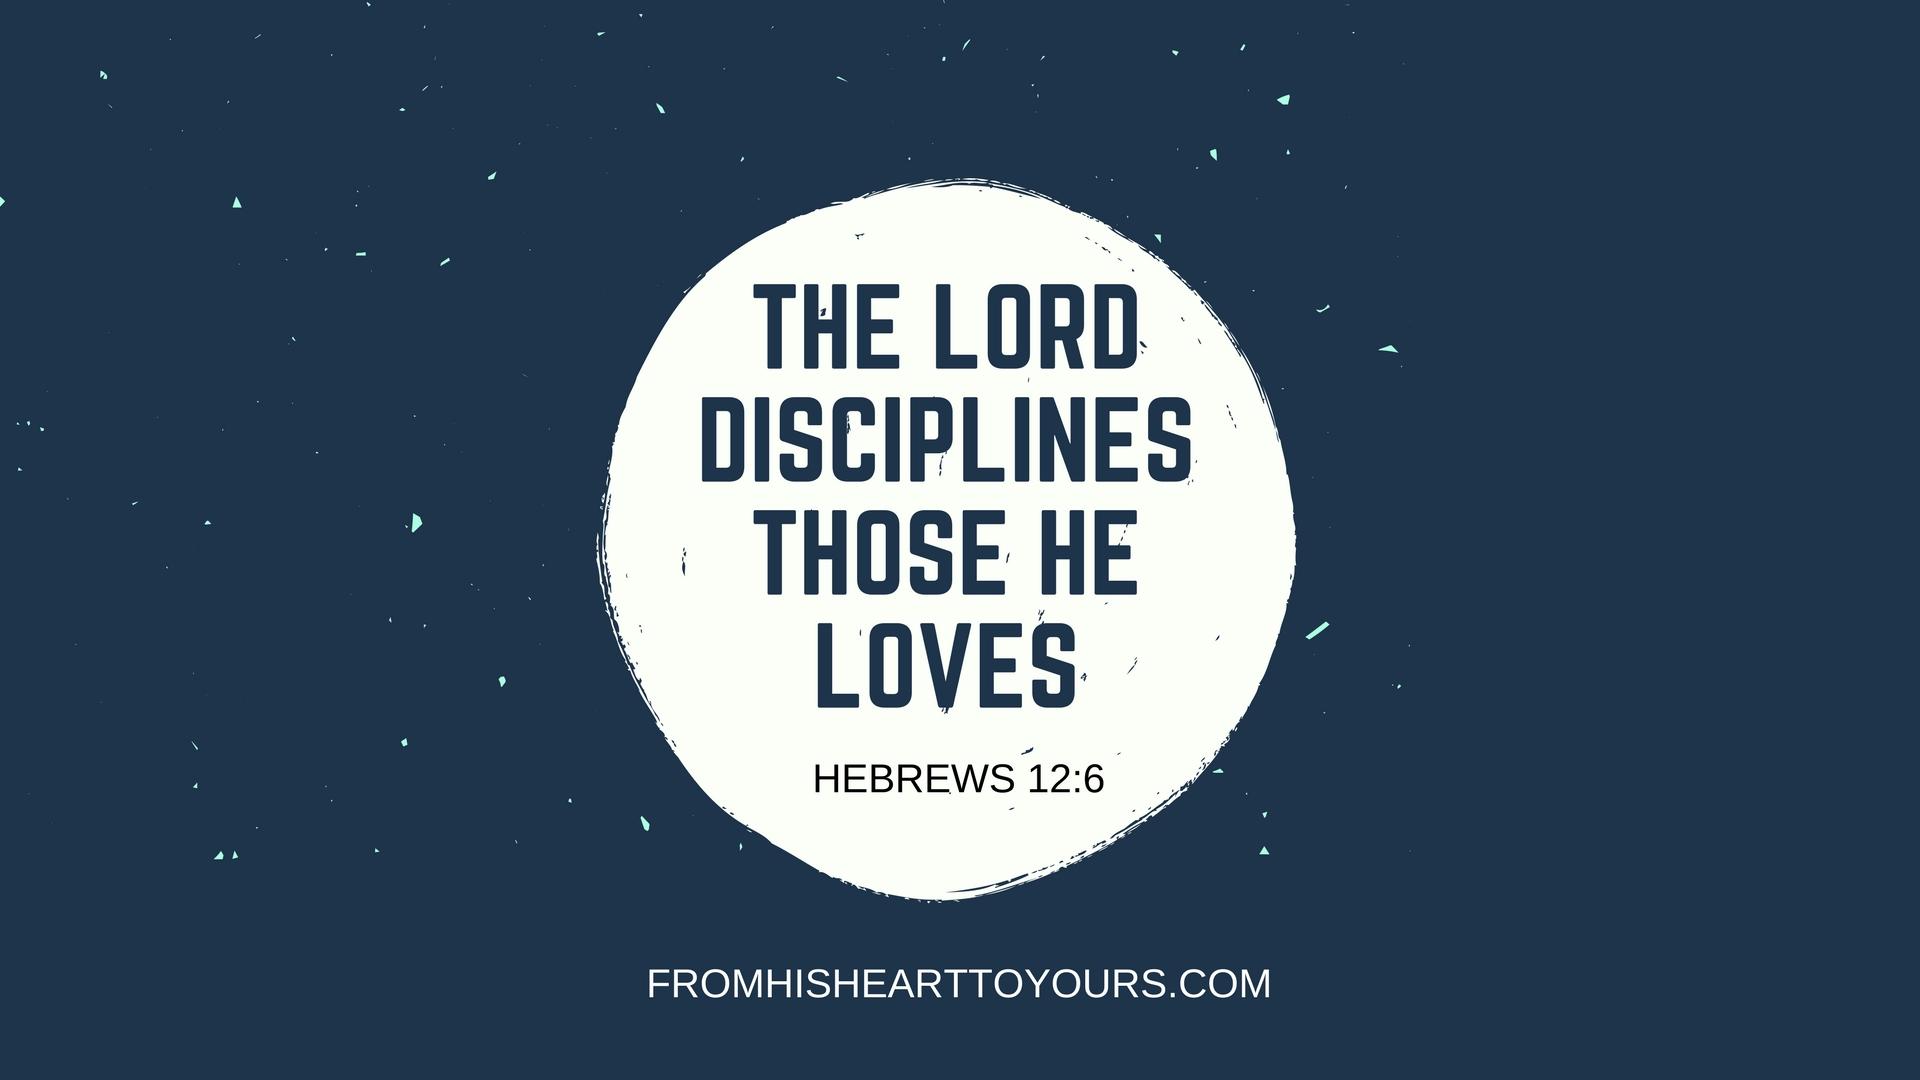 lordsdiscipline